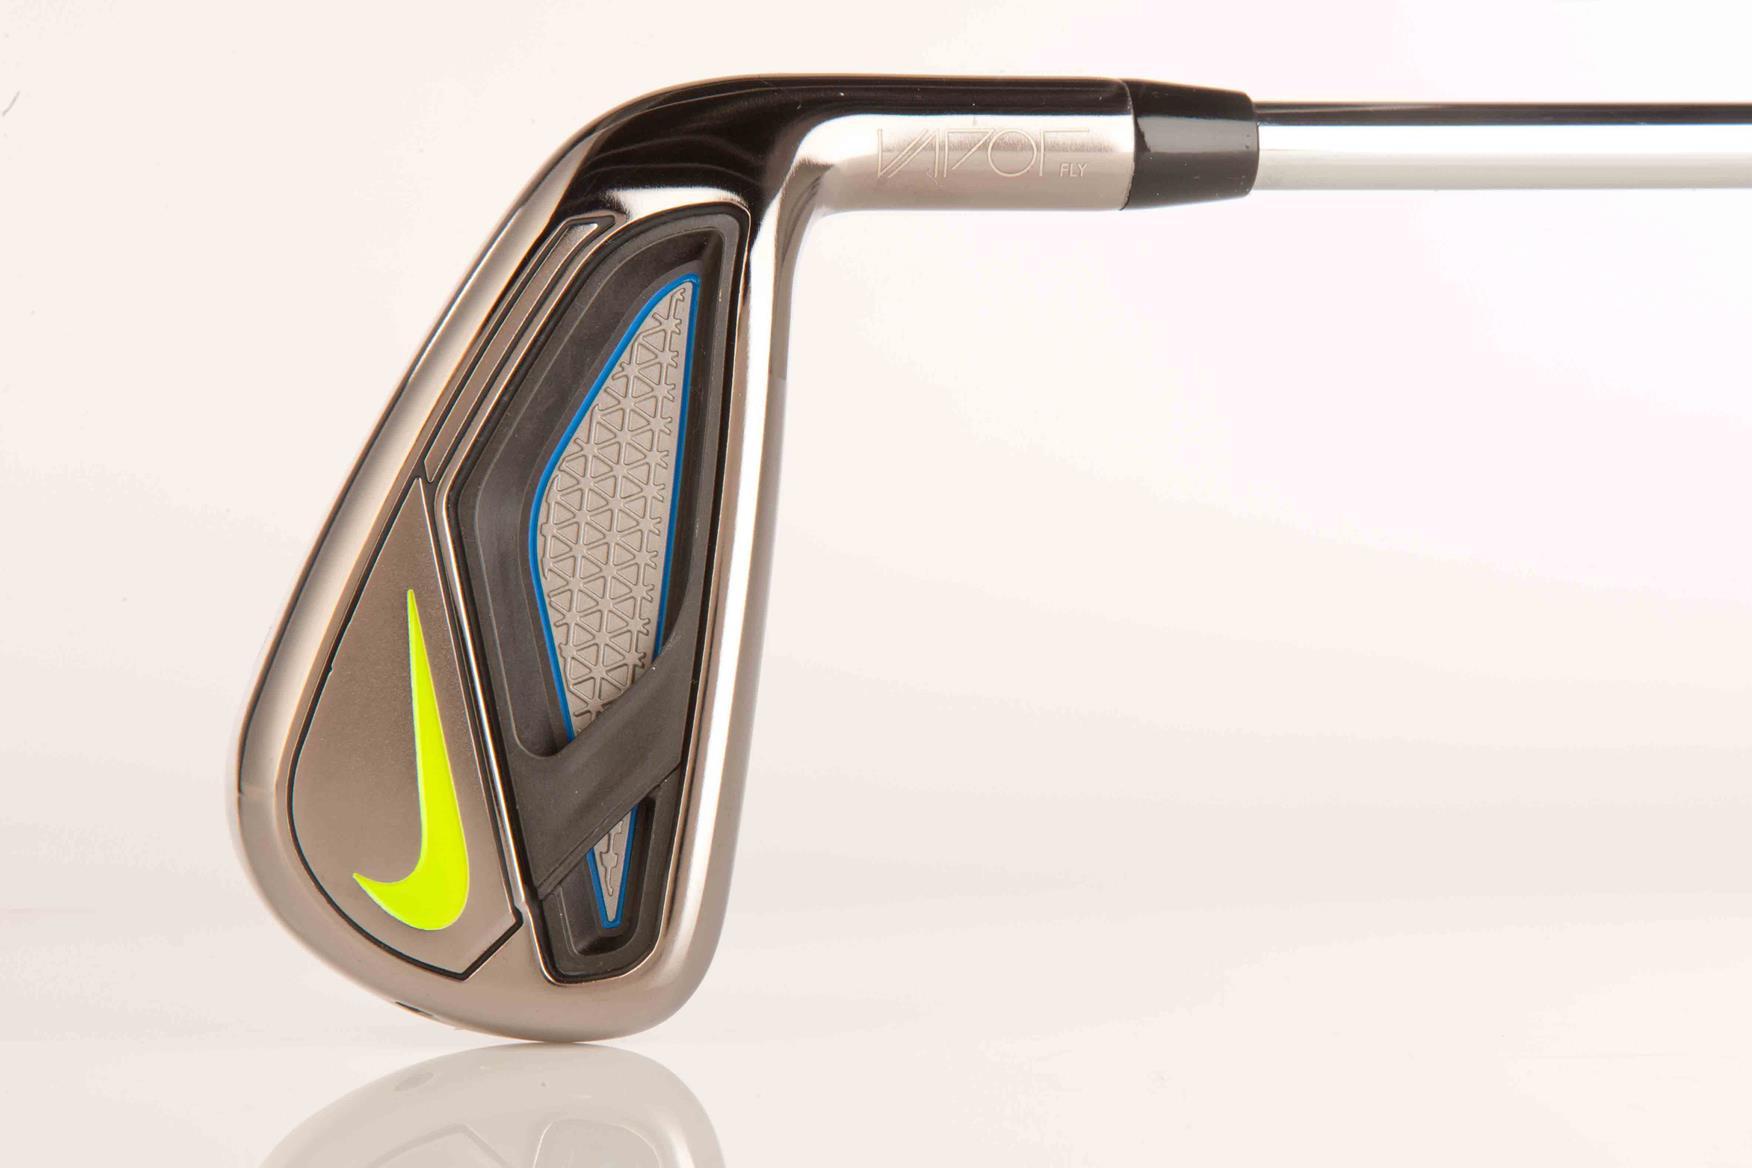 9dbbb2c712677 Nike Golf Clubs Iron  Amazon.com  nike irons golf clubs  sports ...